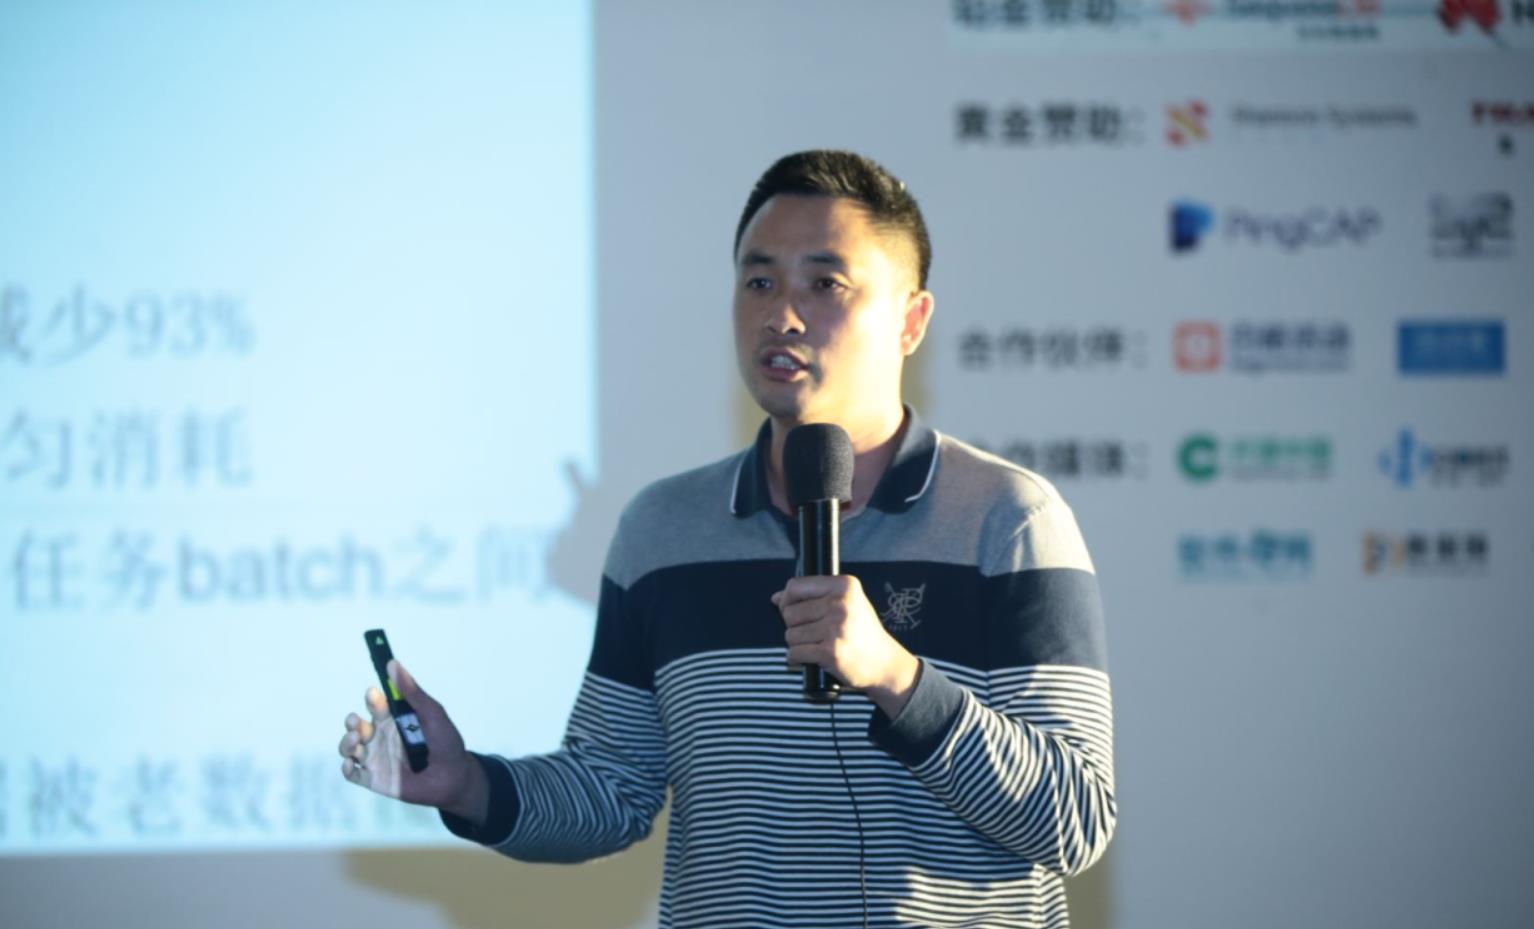 DTCC 干货 | 腾讯营销数据平台